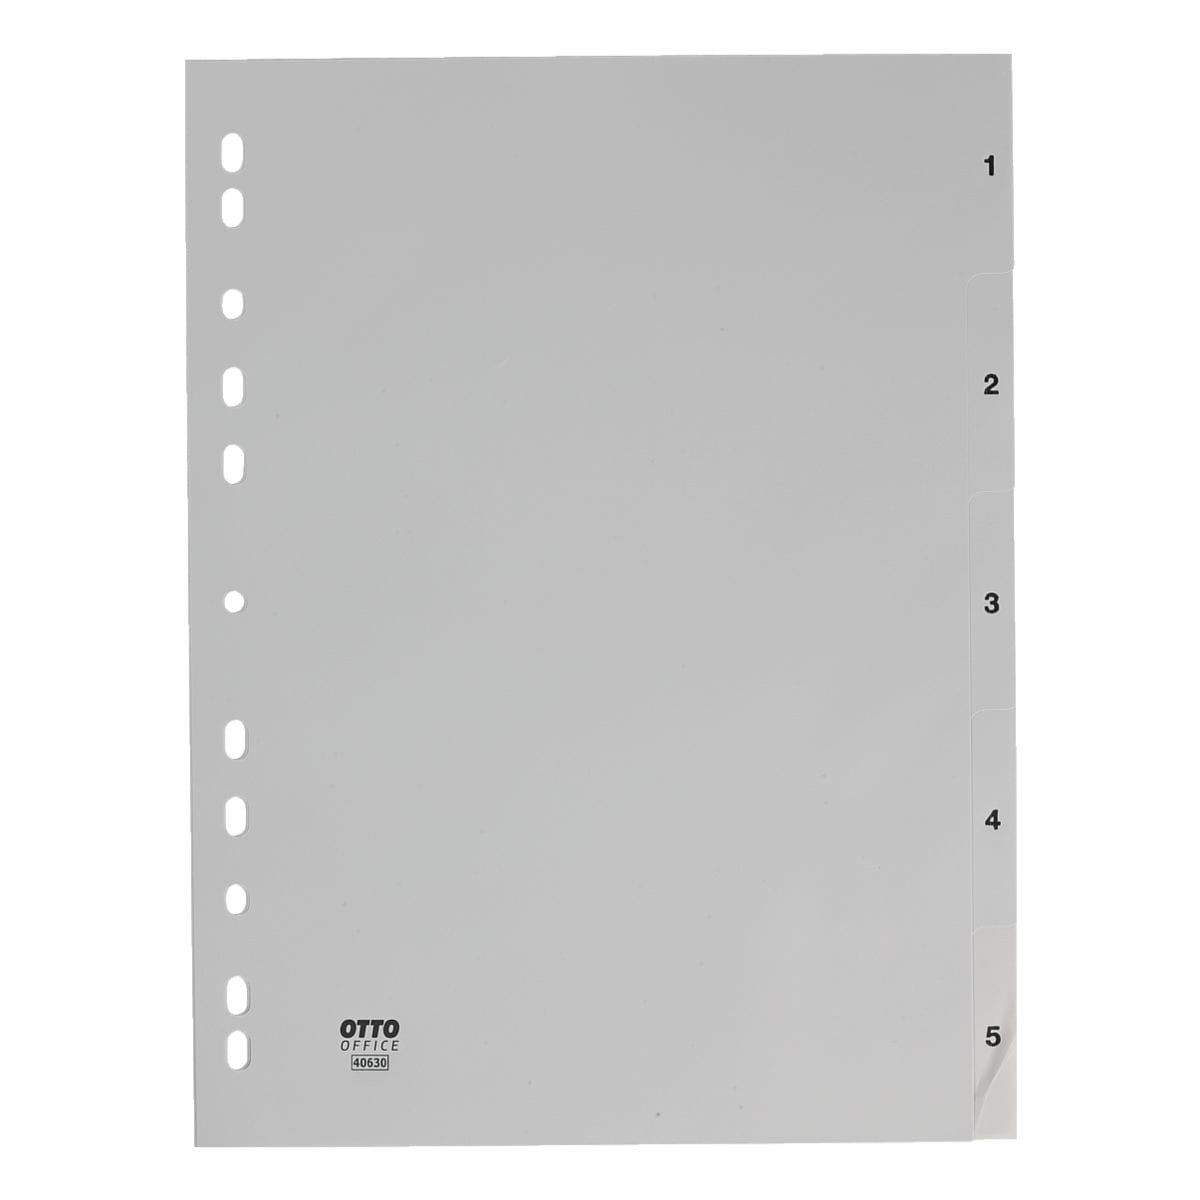 OTTO Office Register, A4, 1-5 5-teilig, grau, Kunststoff